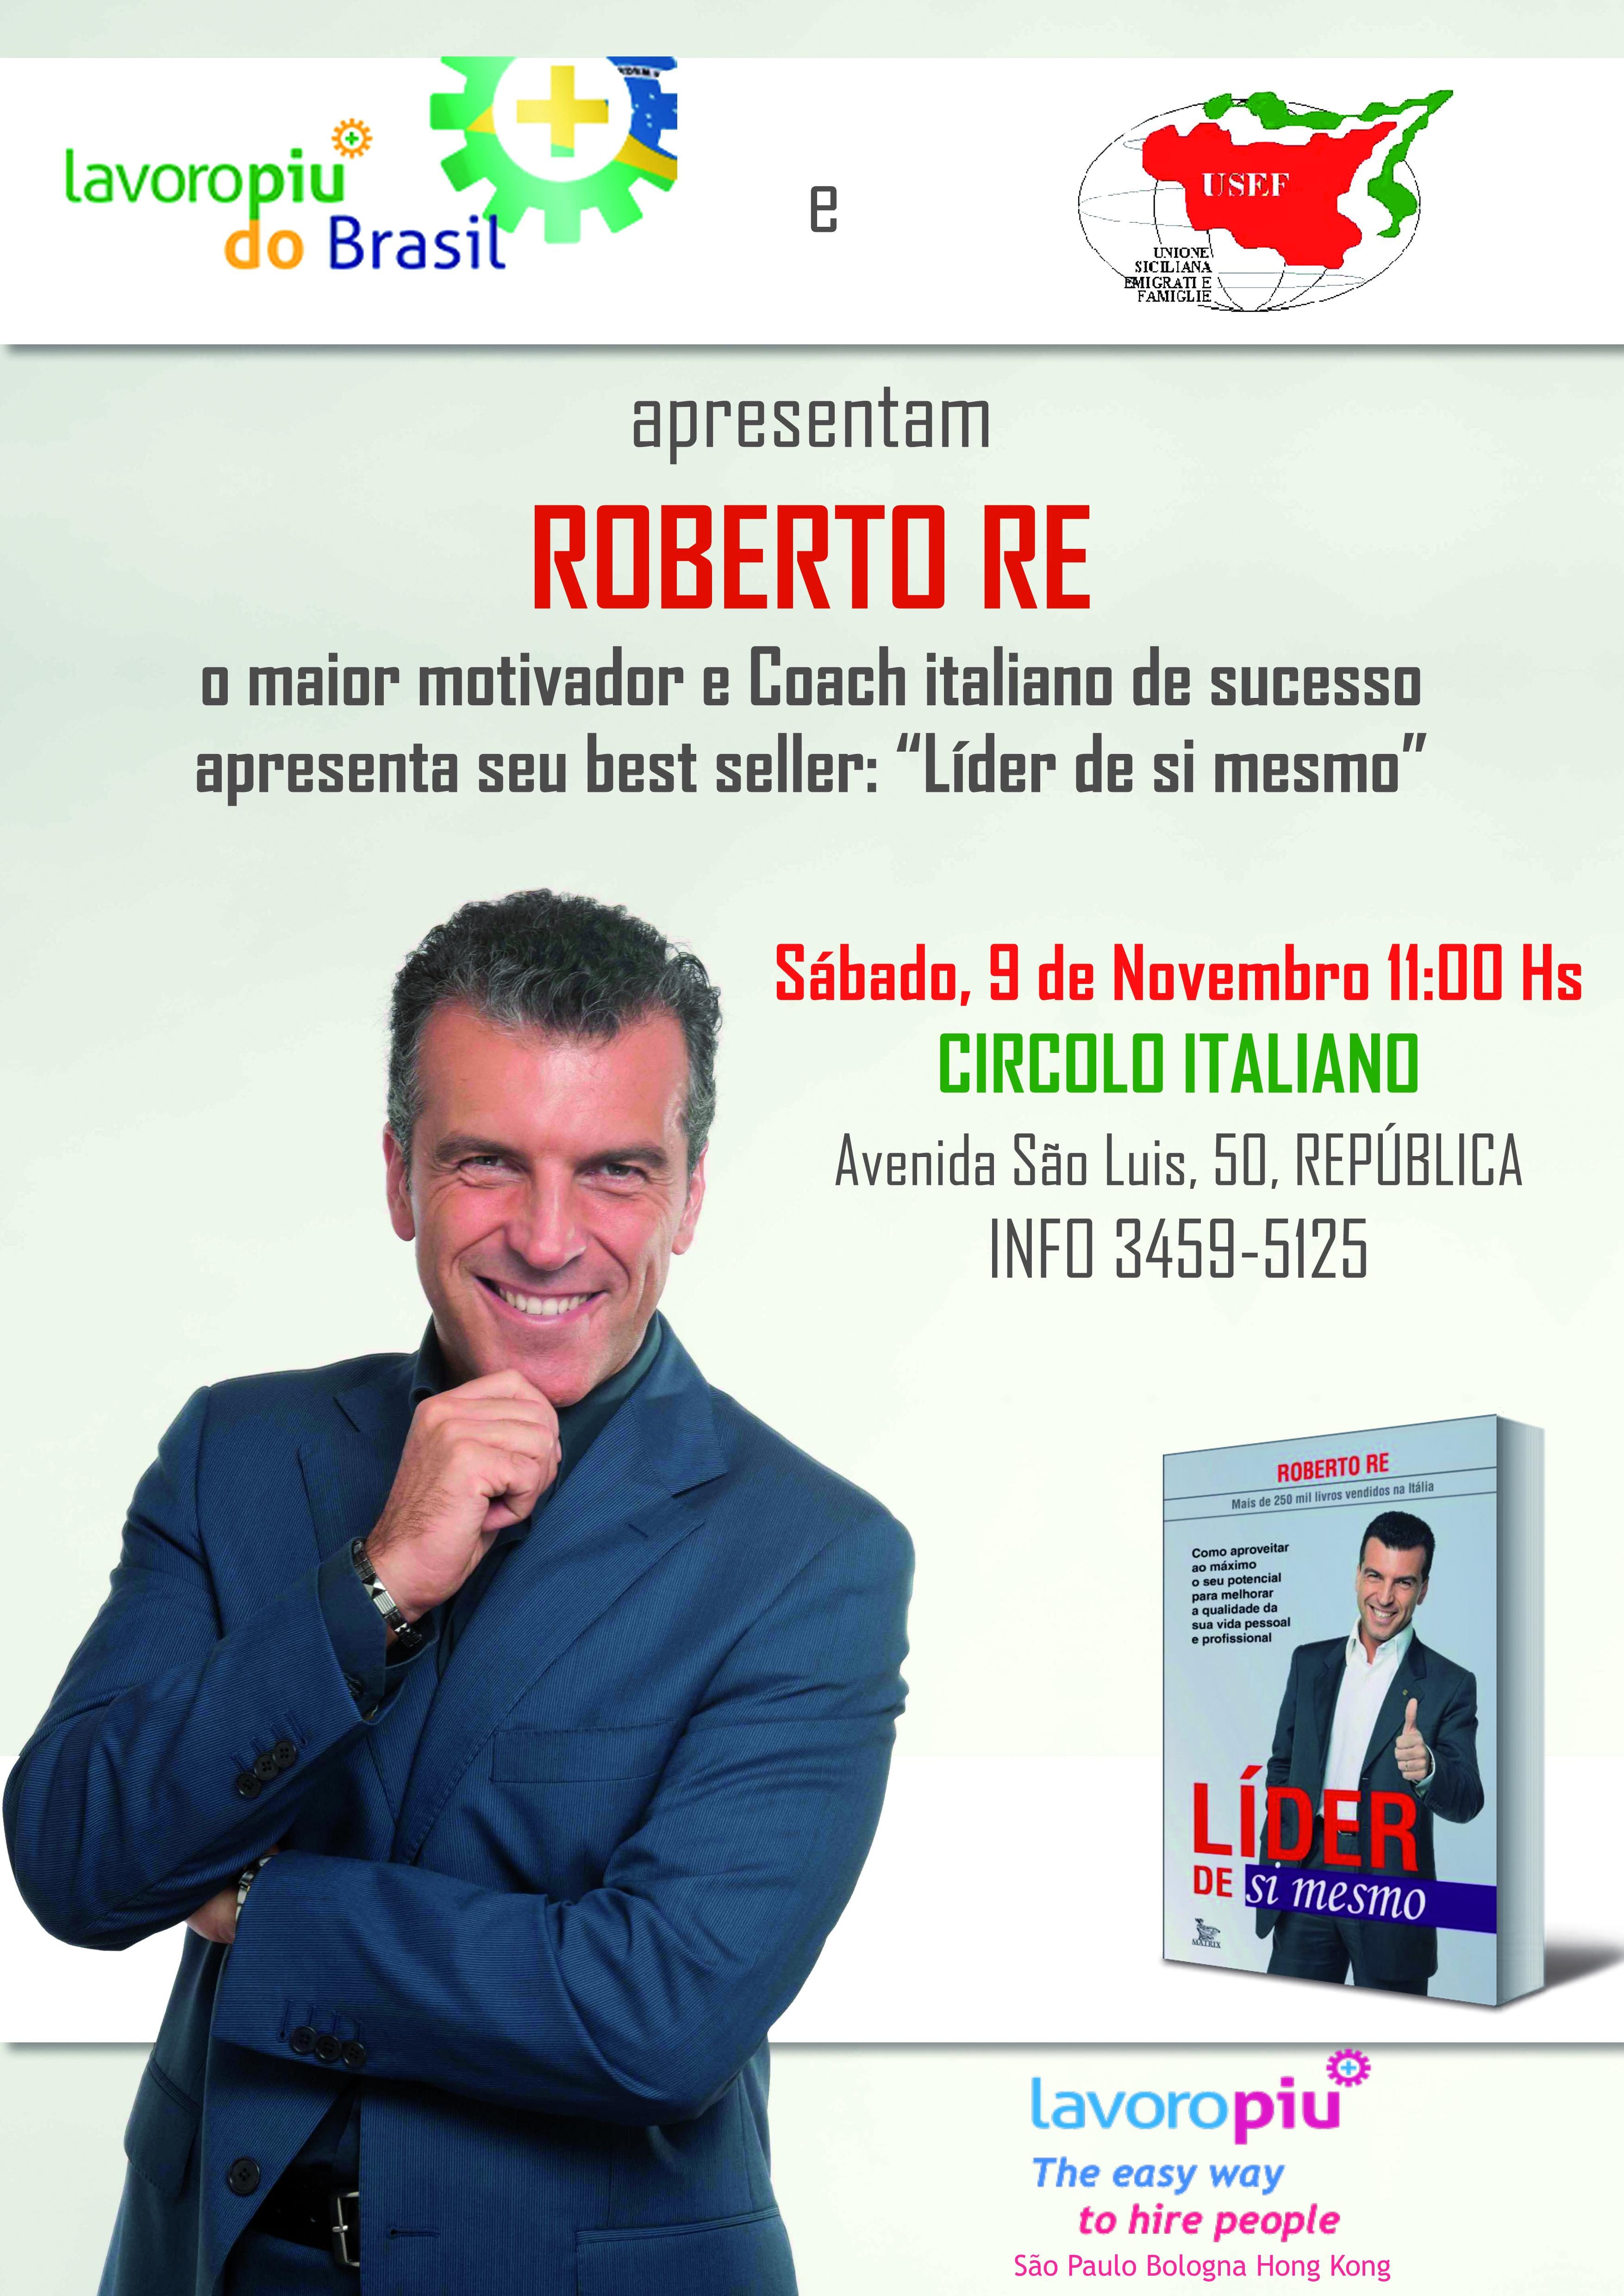 09_11_13_Roberto_Re